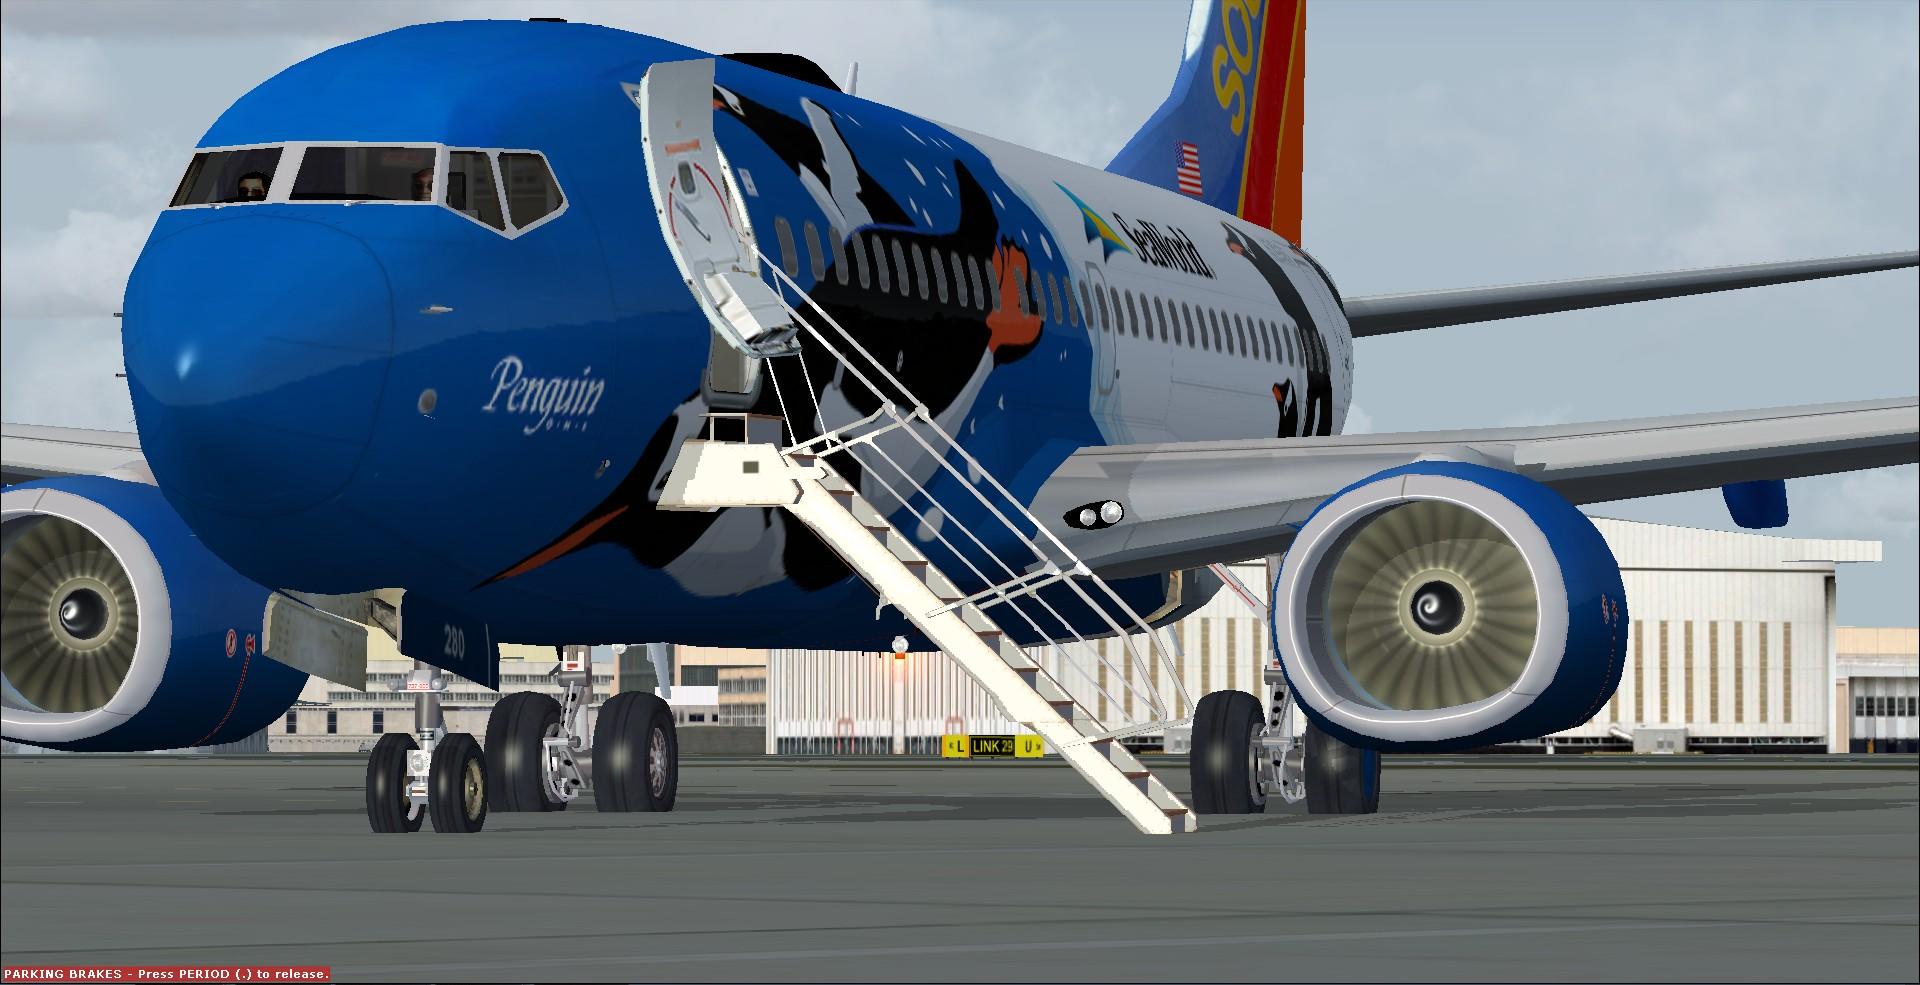 fs-freeware net - FSX Boeing 737-700 Southwest Airlines 'Penguin One